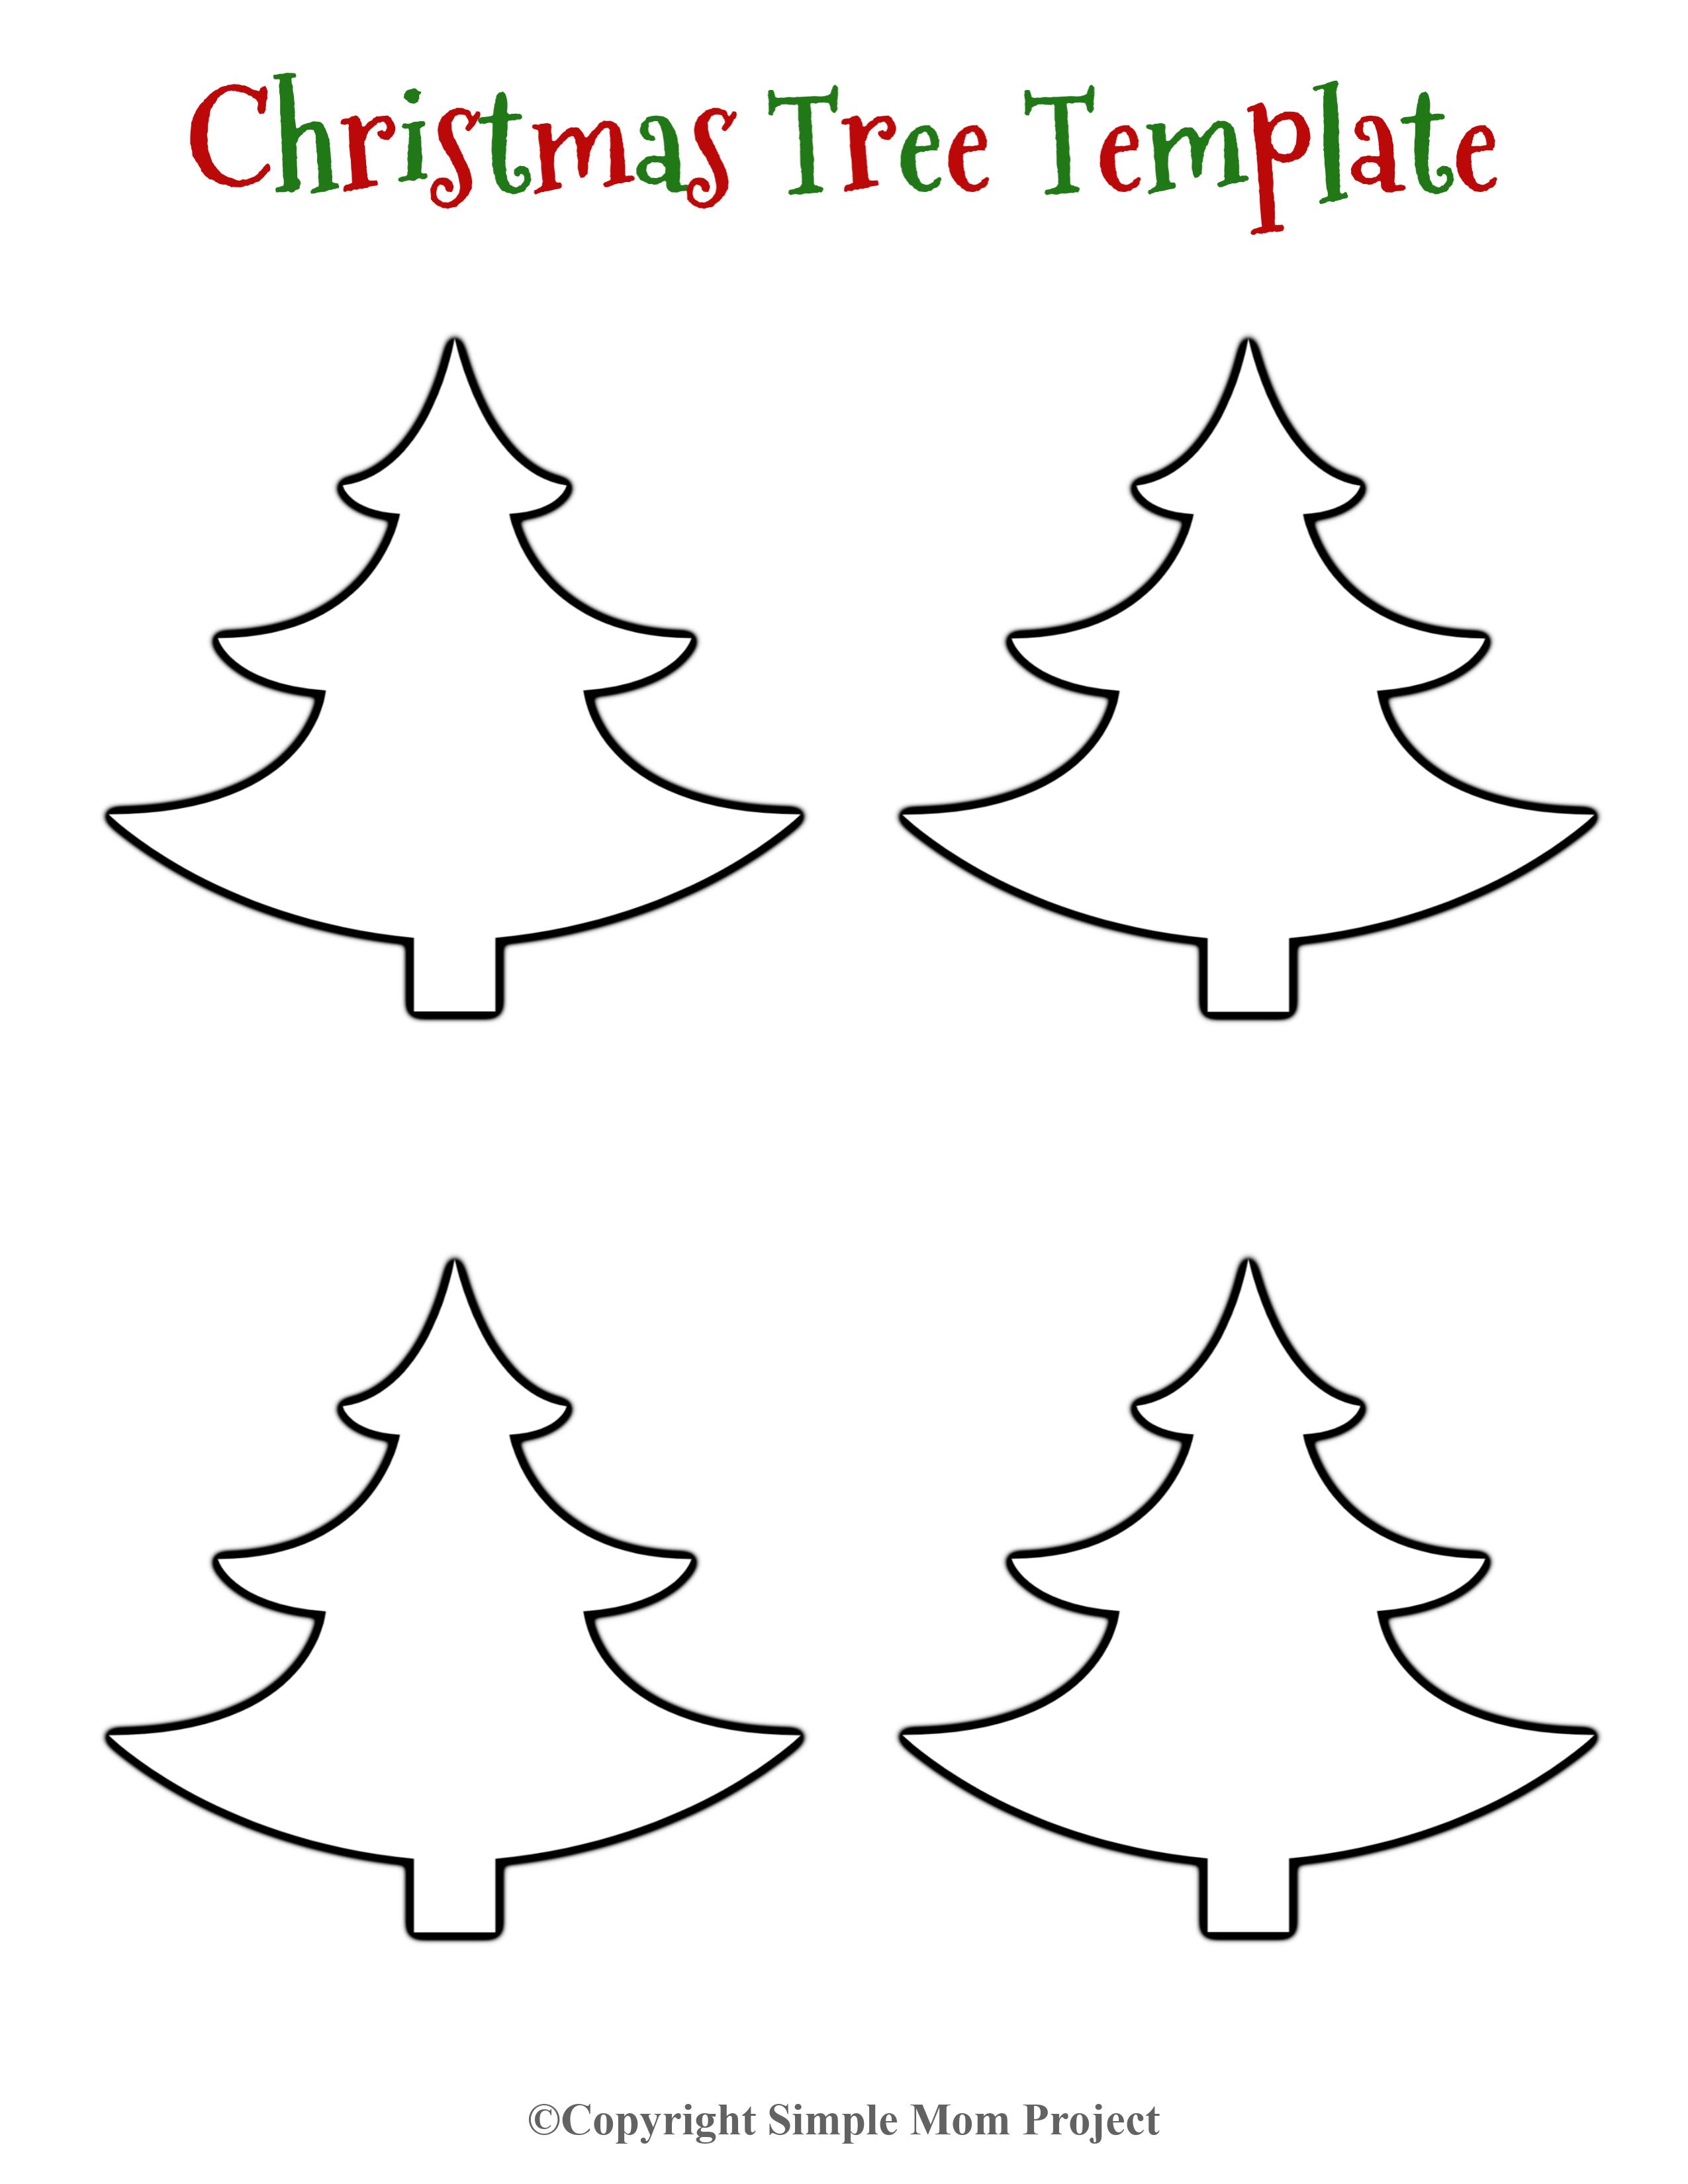 8 Free Printable Large Snowflake Templates Simple Mom Project Christmas Tree Template Diy Christmas Tags Free Christmas Printables